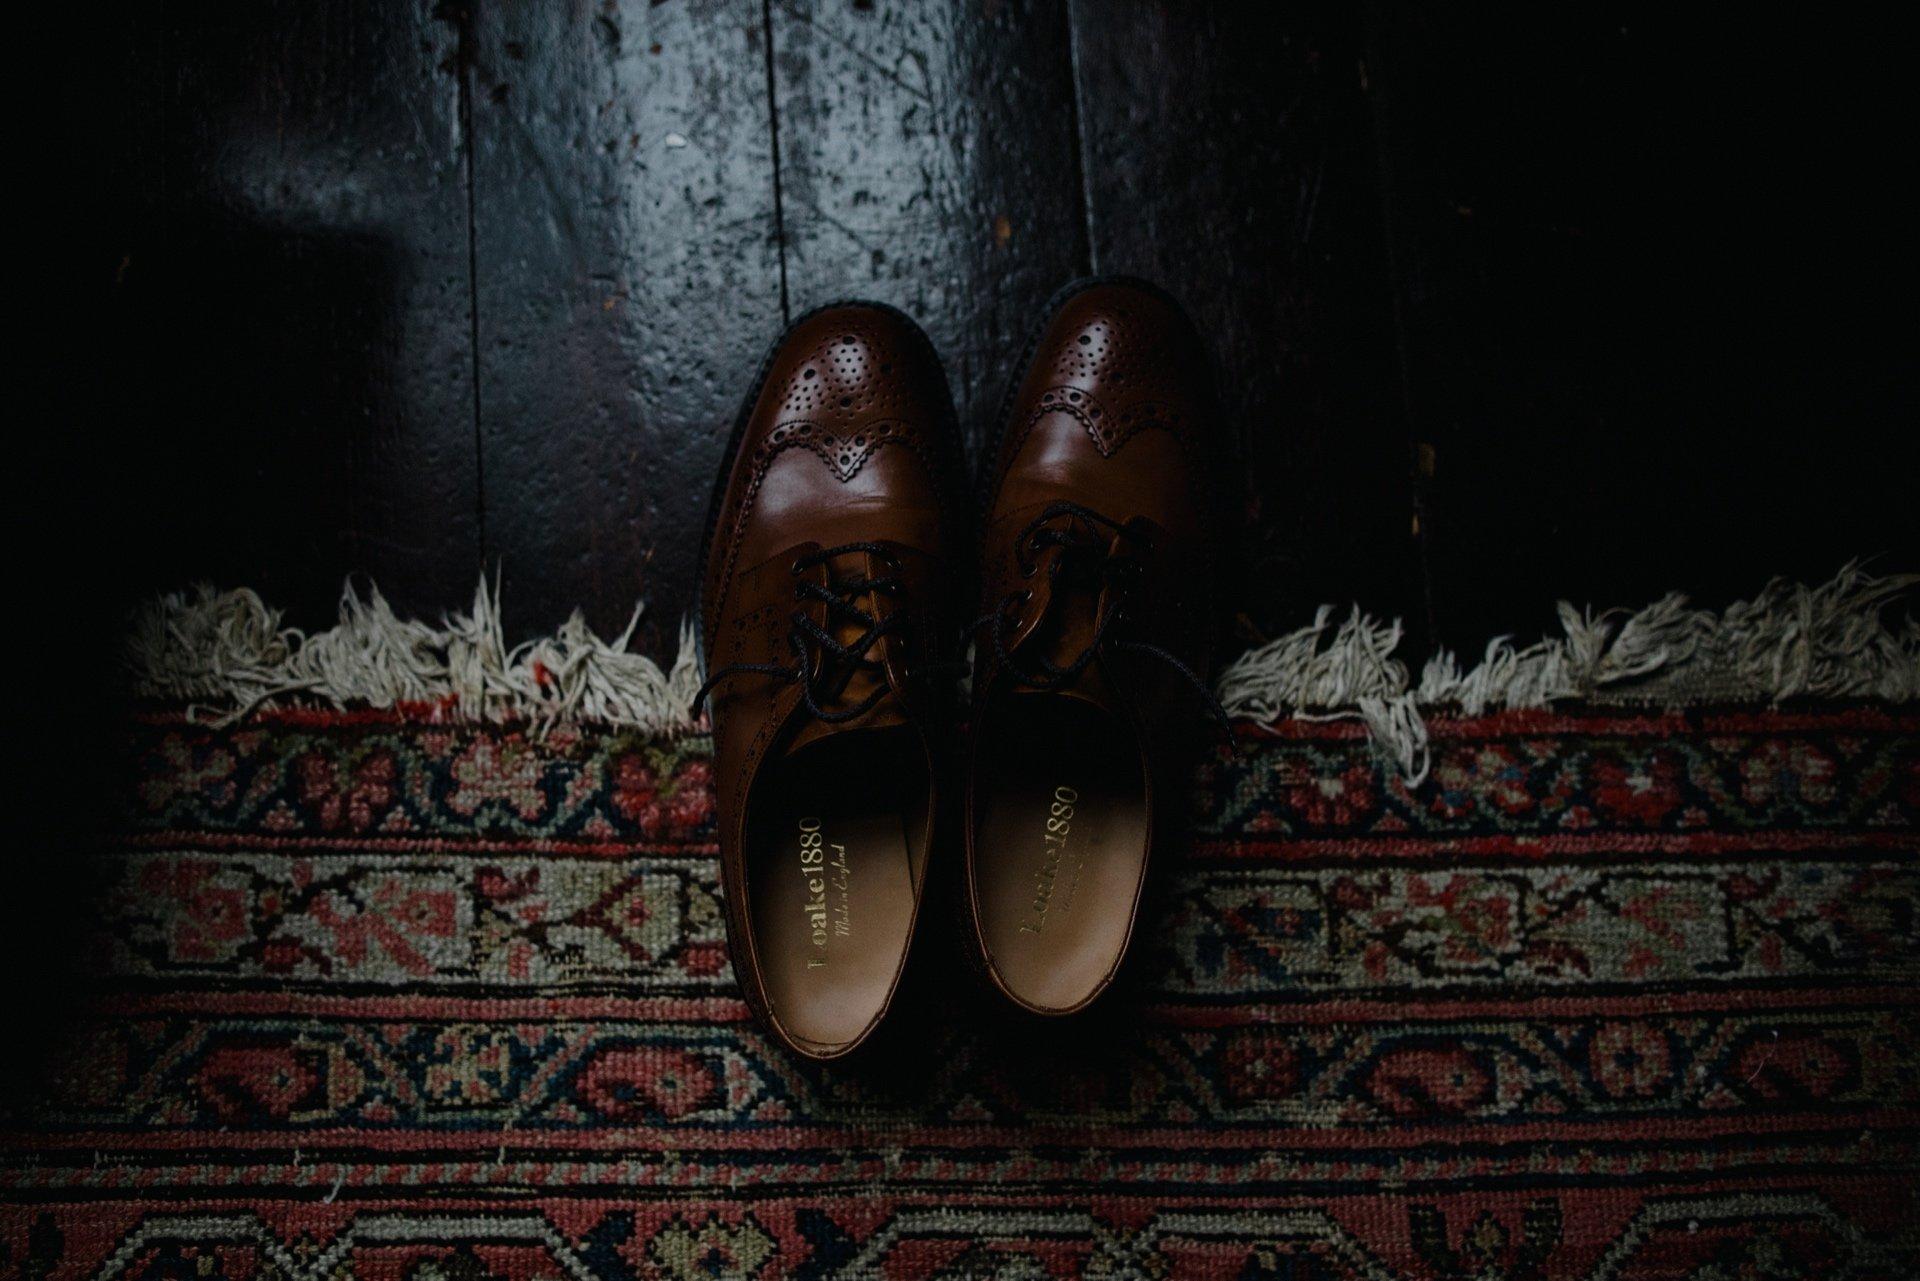 grooms shoes on vintage carpet